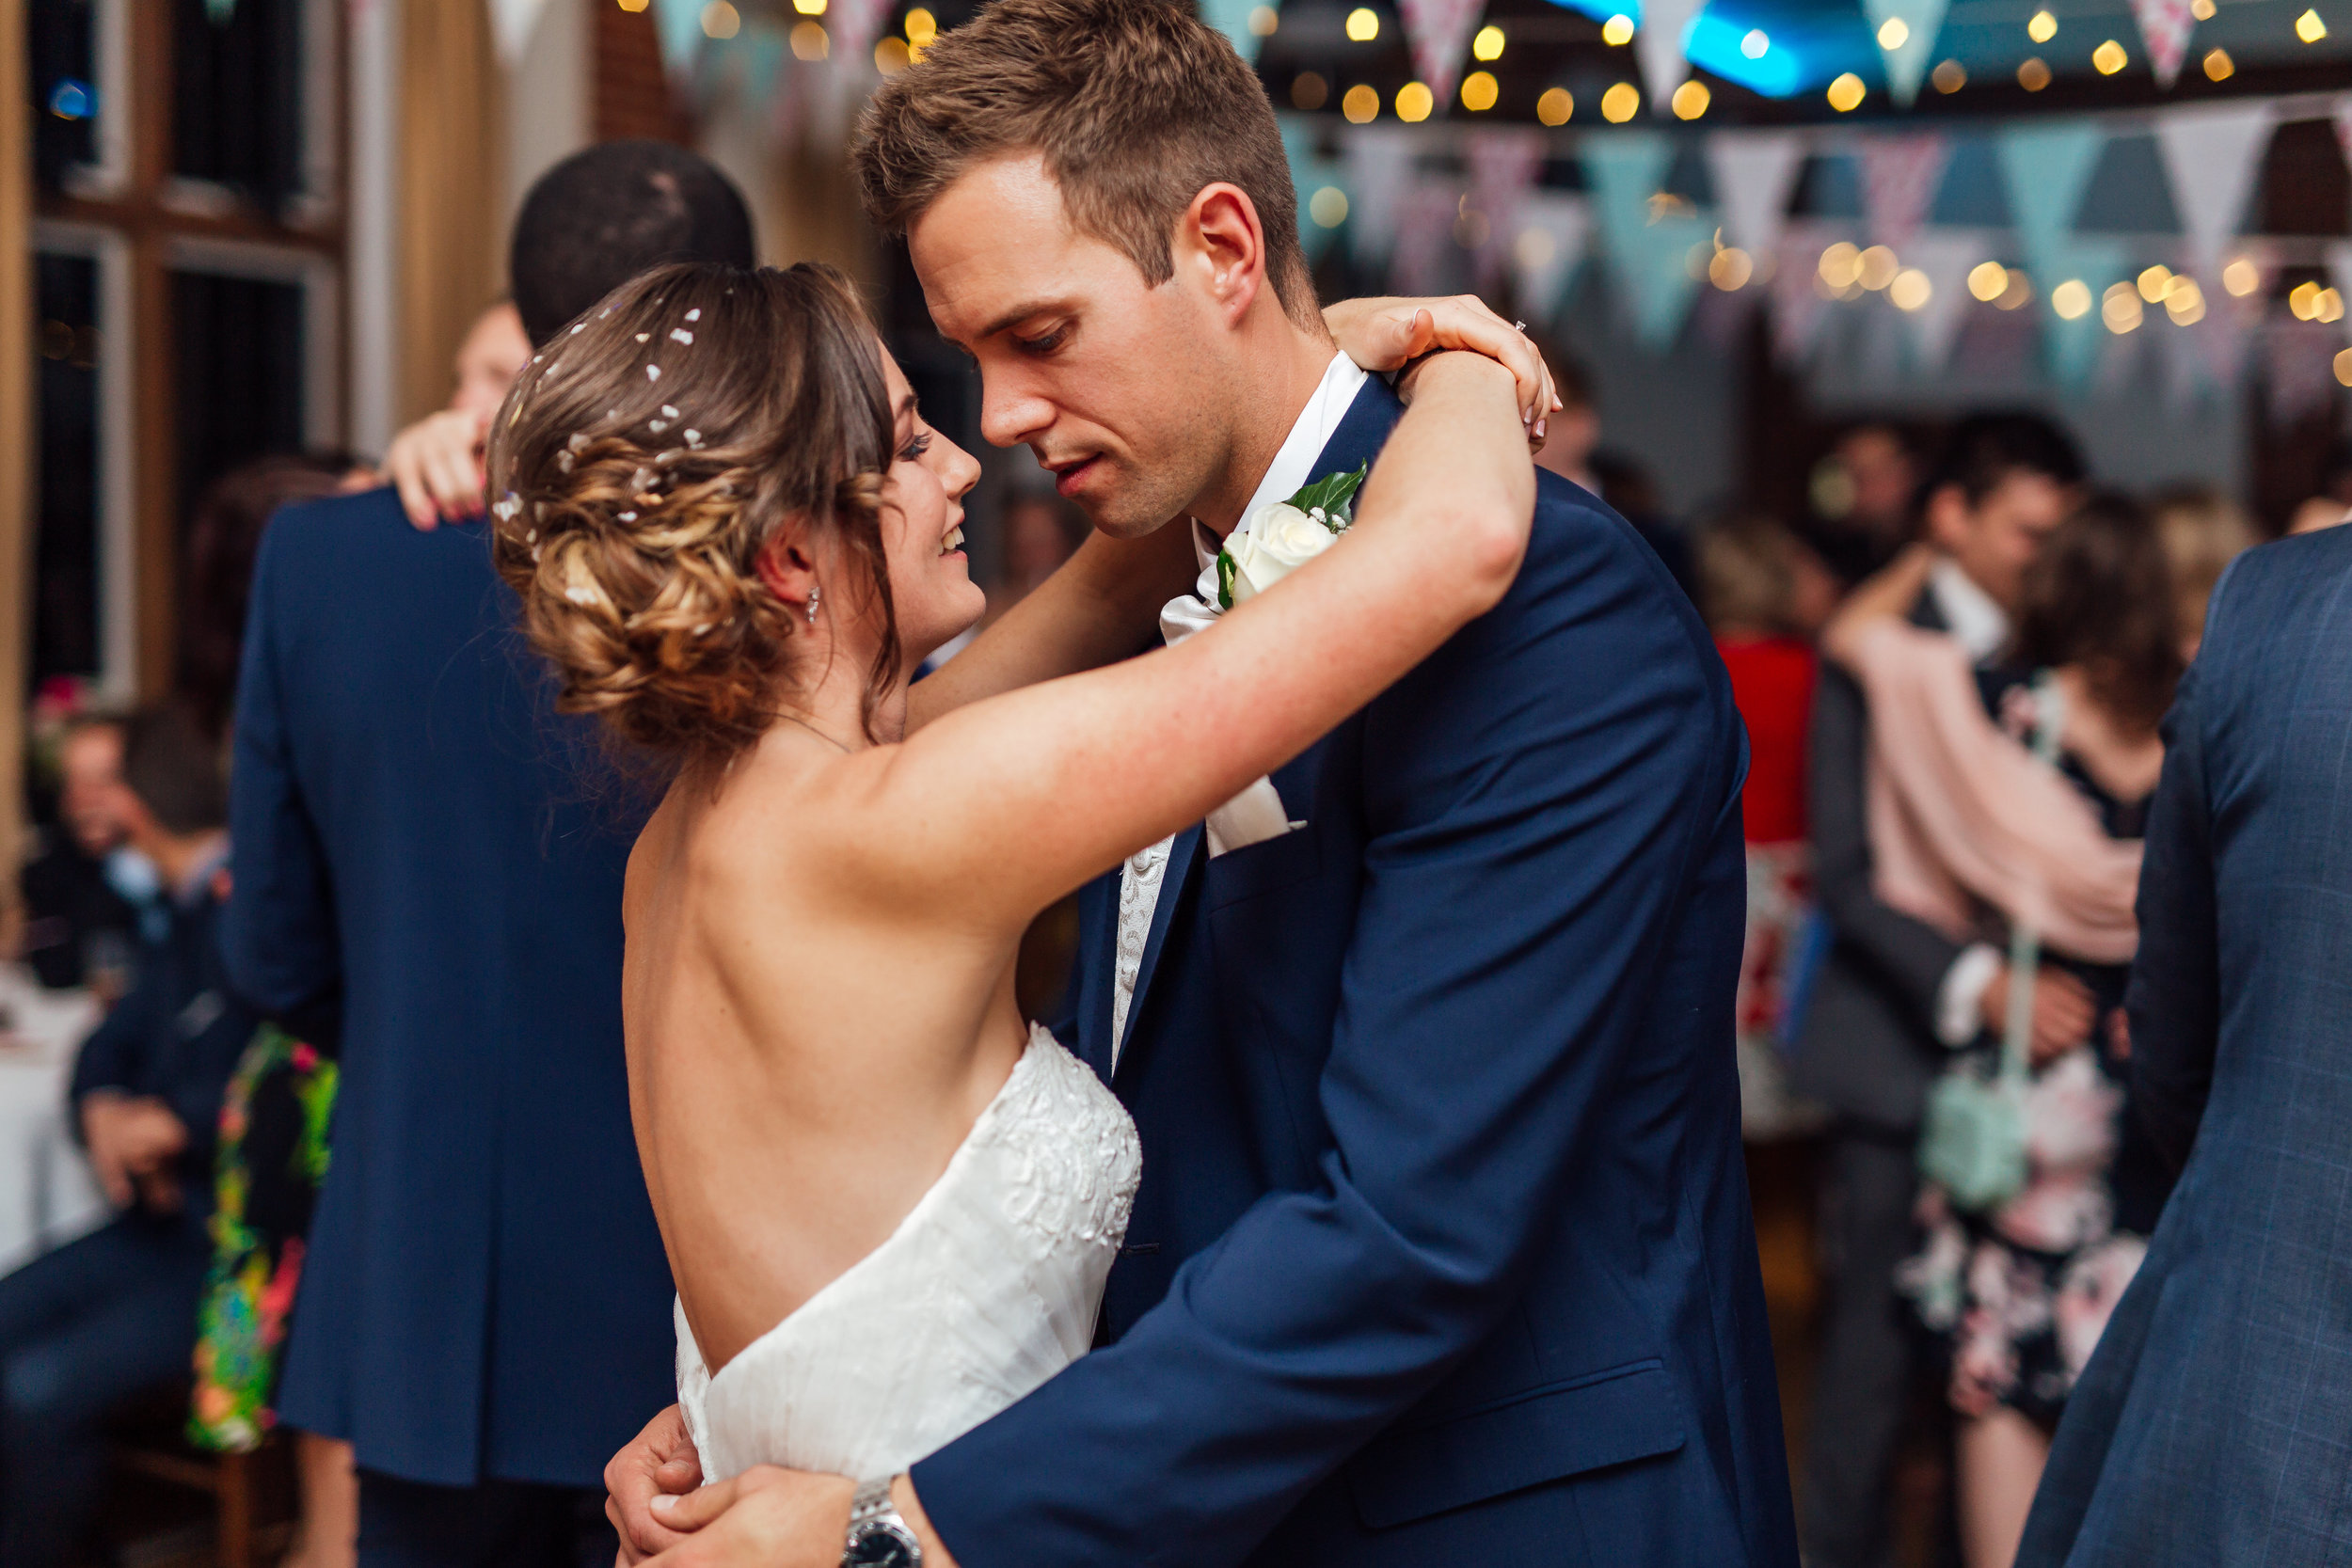 bride-groom-first-dance-rotherwick-village-hall-weddinghampshire / hampshire-wedding-photographer-hampshire / Amy-james-photography / hampshire-village-hall-wedding